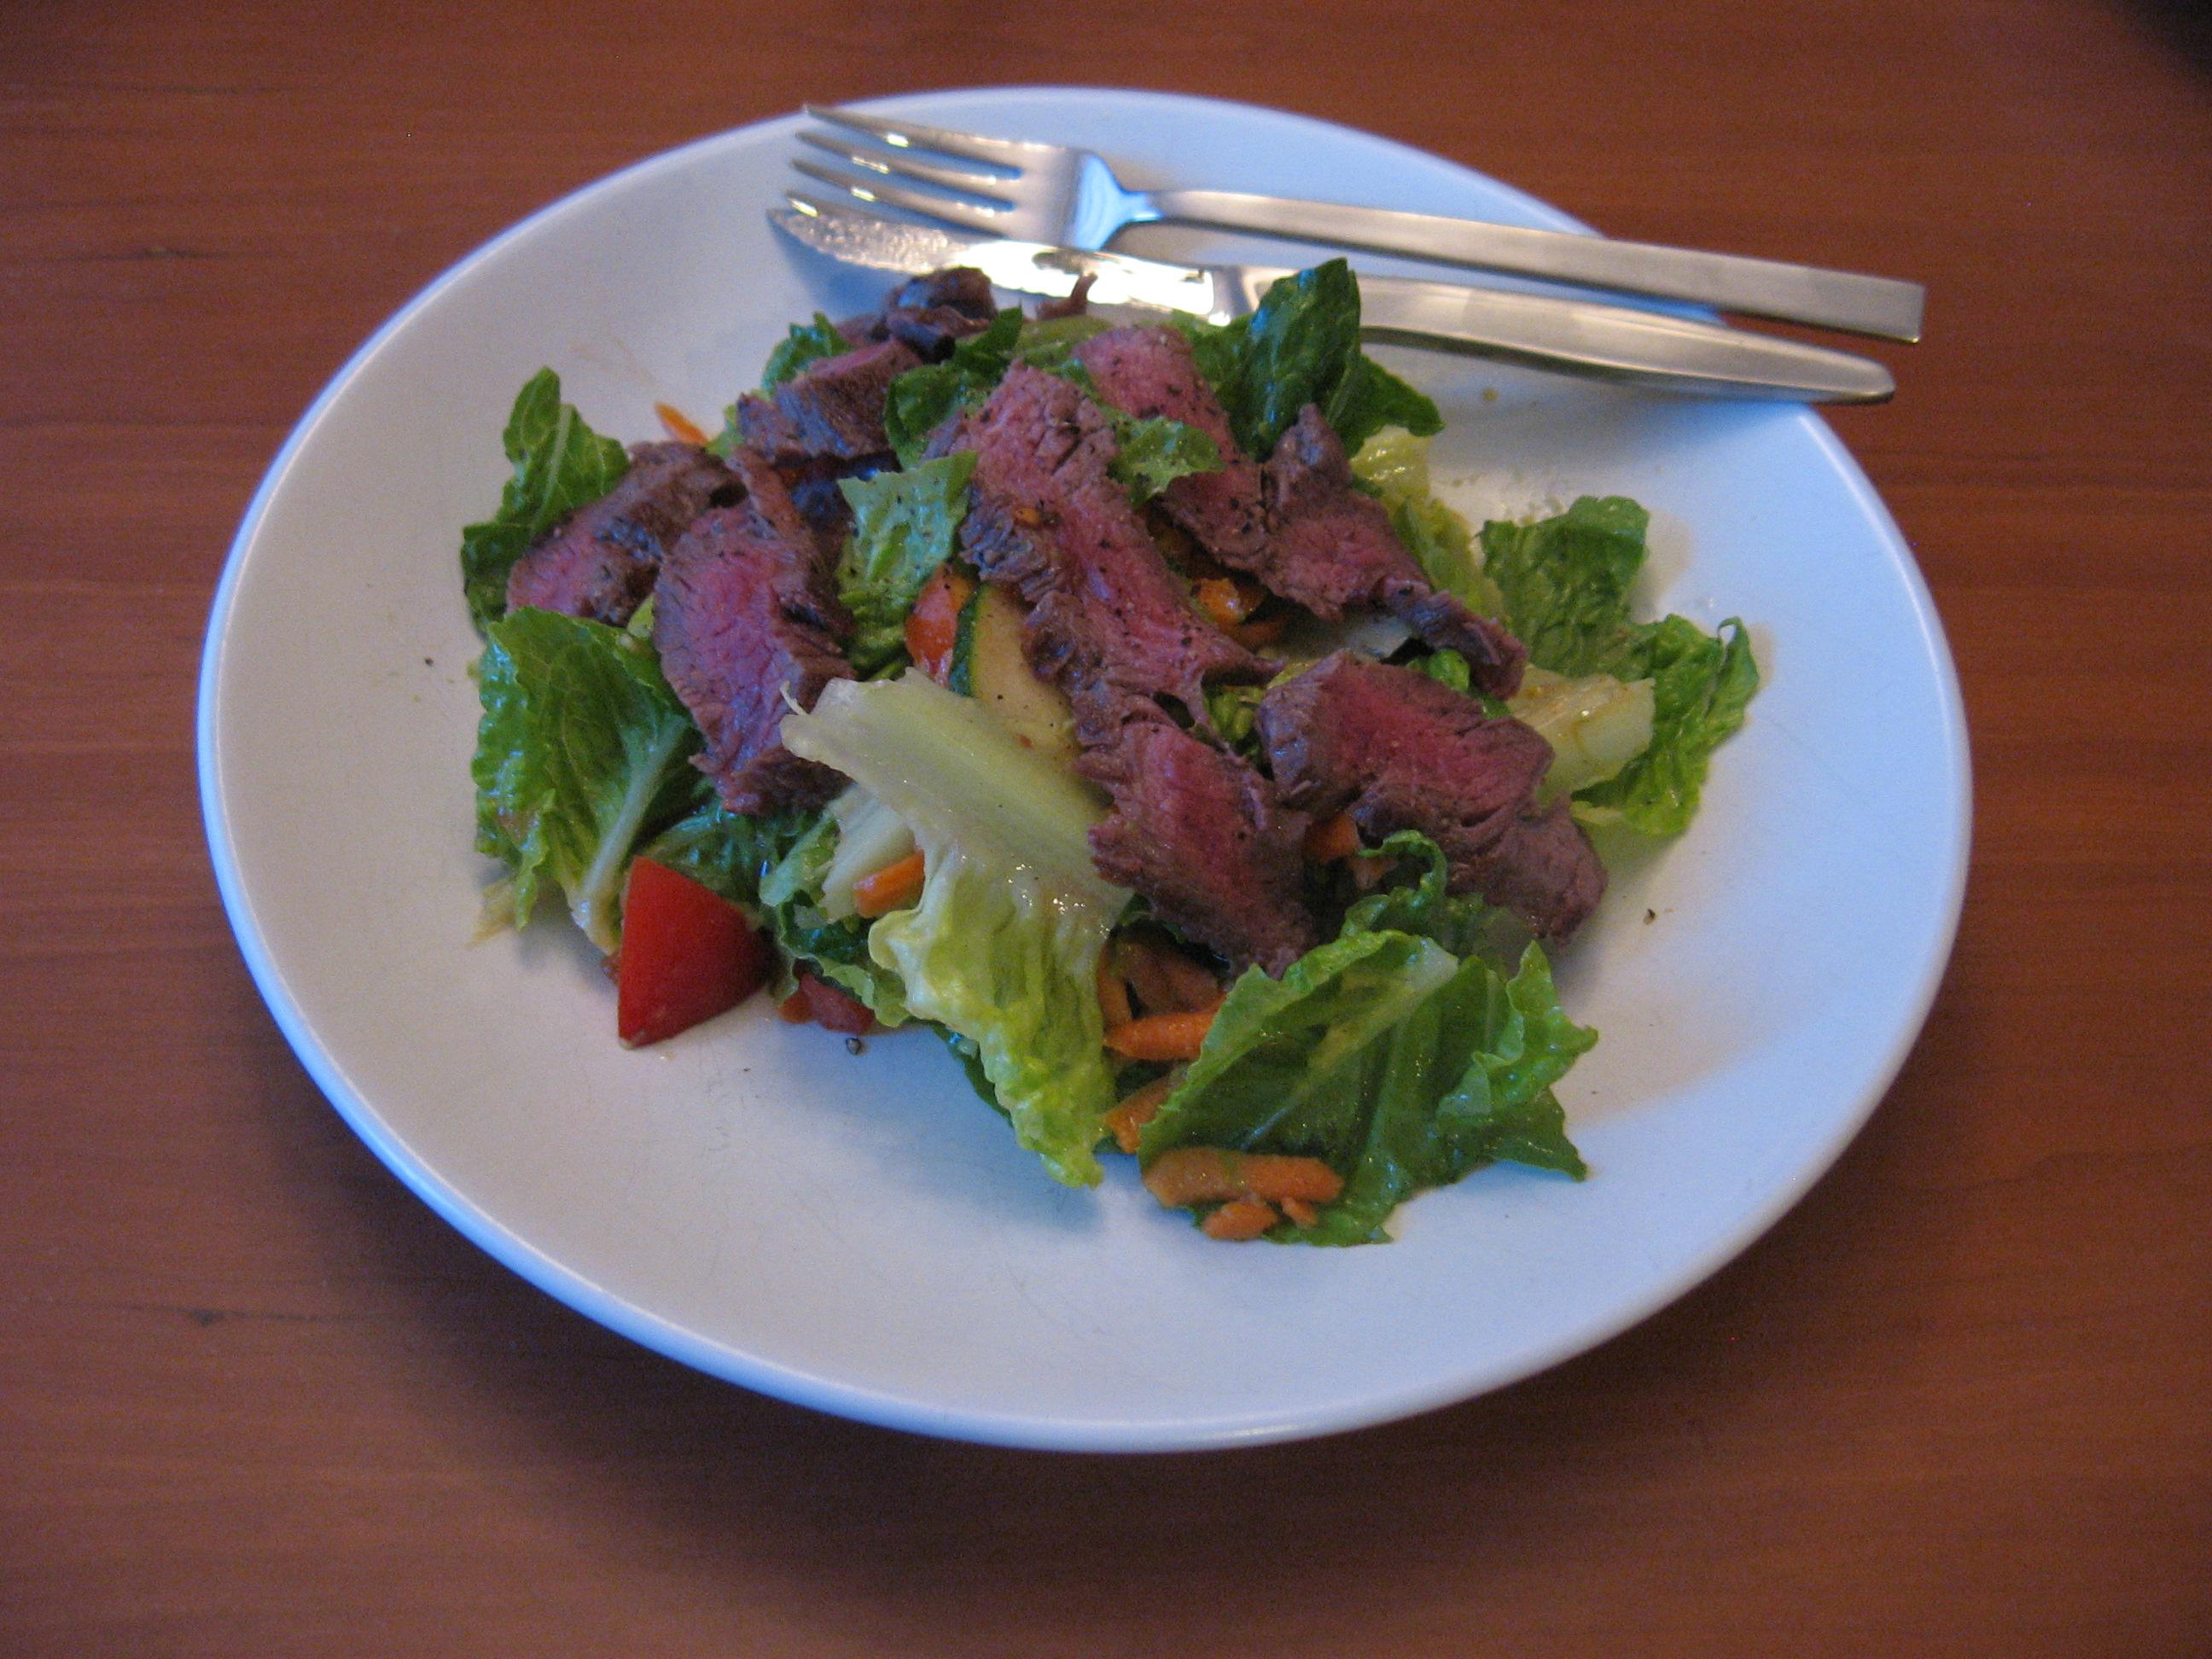 Warm Steak Salad with Red Wine Vinaigrette